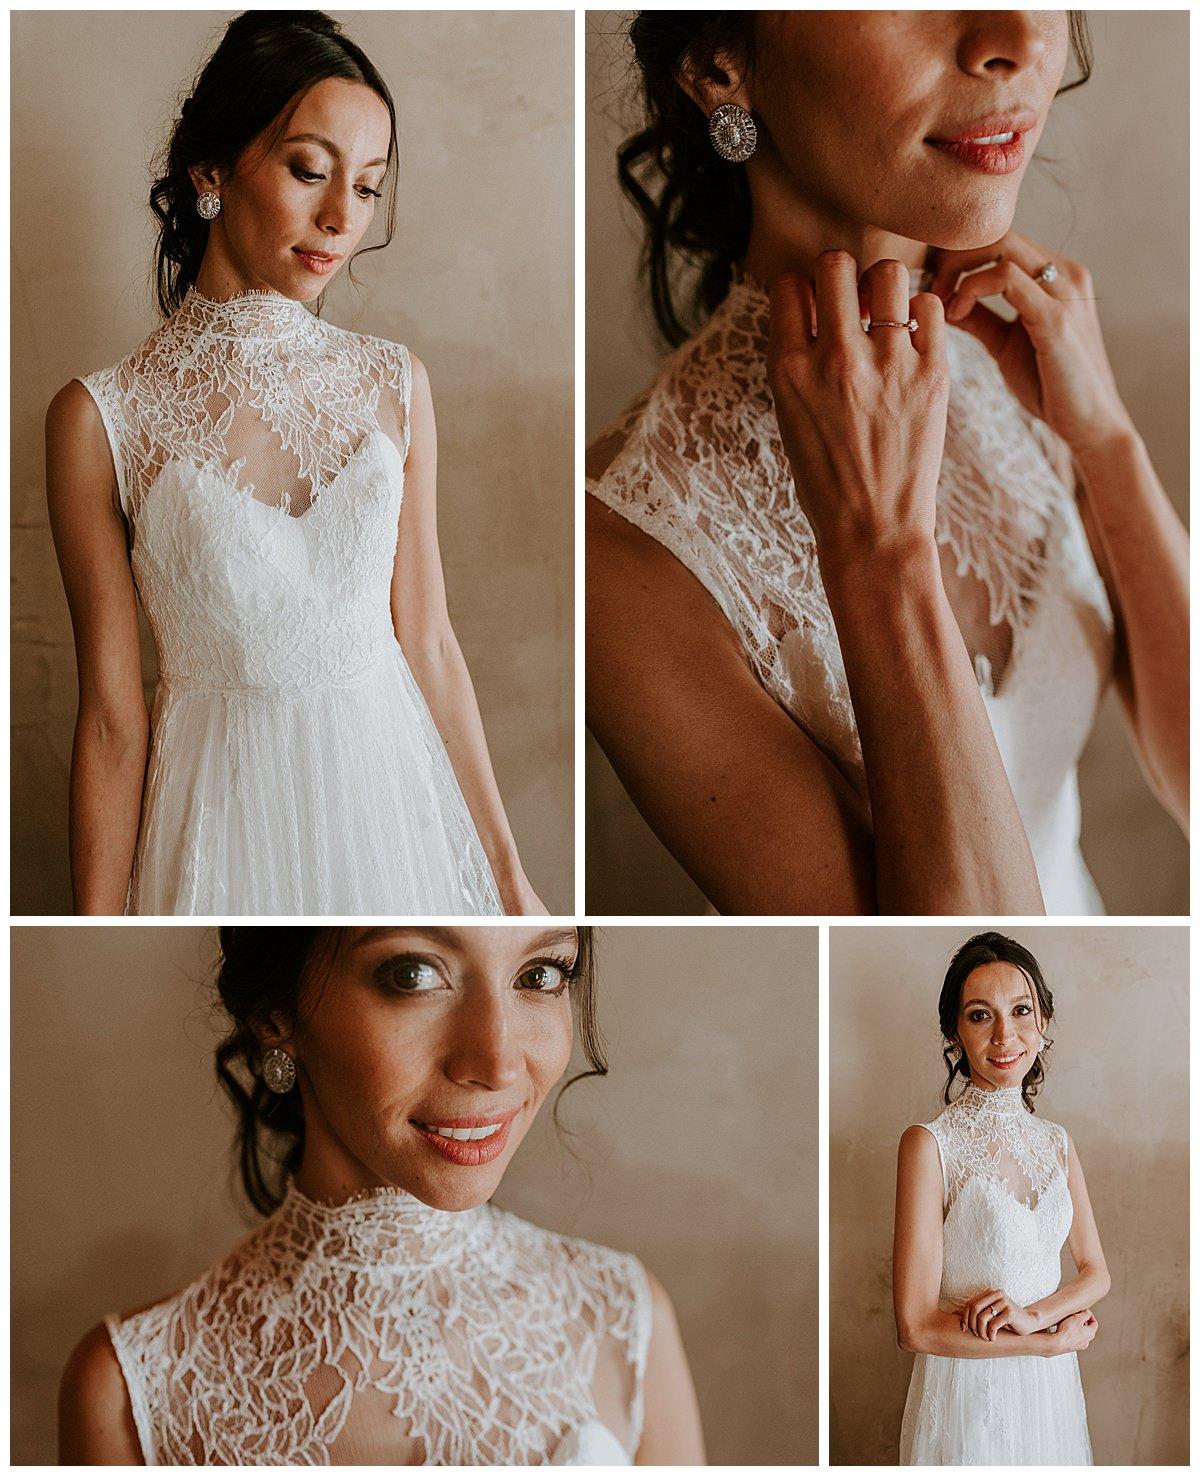 FOTO+PHOTO+BODA+WEDDING+ITALIA+ITALY+MAURICIO+GARAY+MAURICIOGARAY+WEDDINPHOTOGRAPHER+FOTOGRAFODEBODA-15_0008.jpg